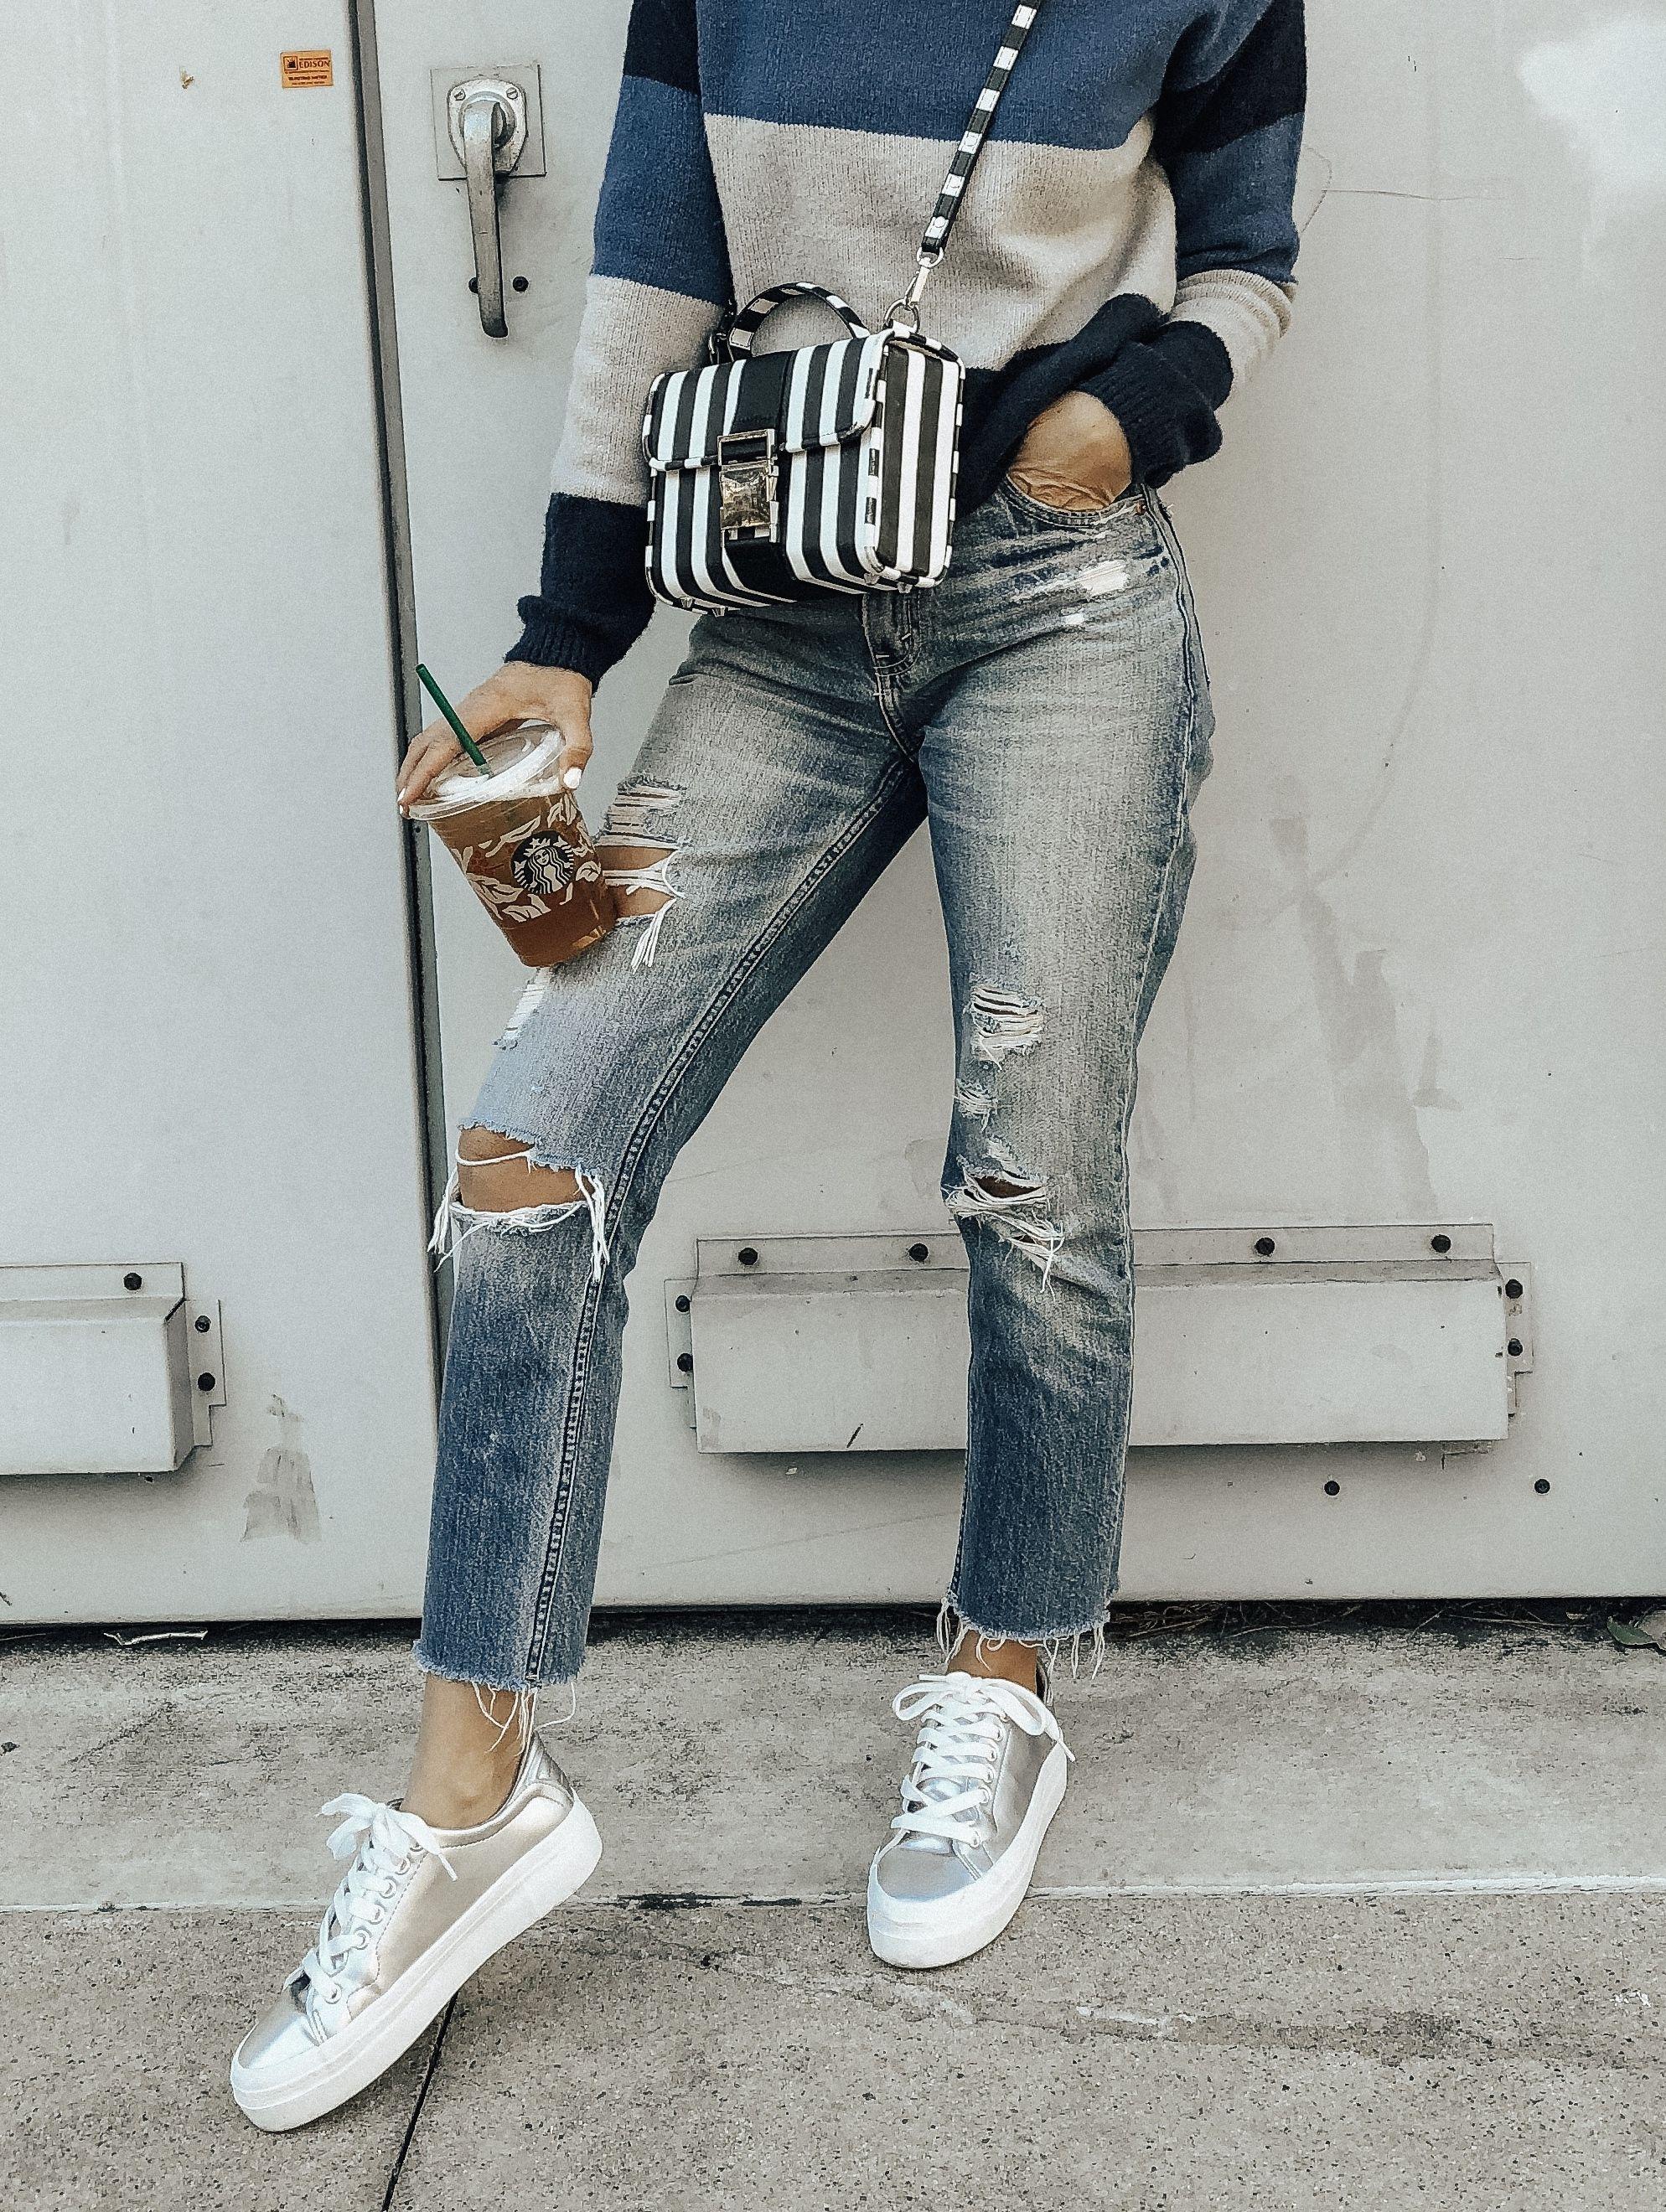 e34cb64d798 ROCKET DOG PLATFORM SNEAKERS- Jaclyn De Leon Style + metallic silver  platform shoes + distressed denim + striped sweater + target style + retro  style + fall ...